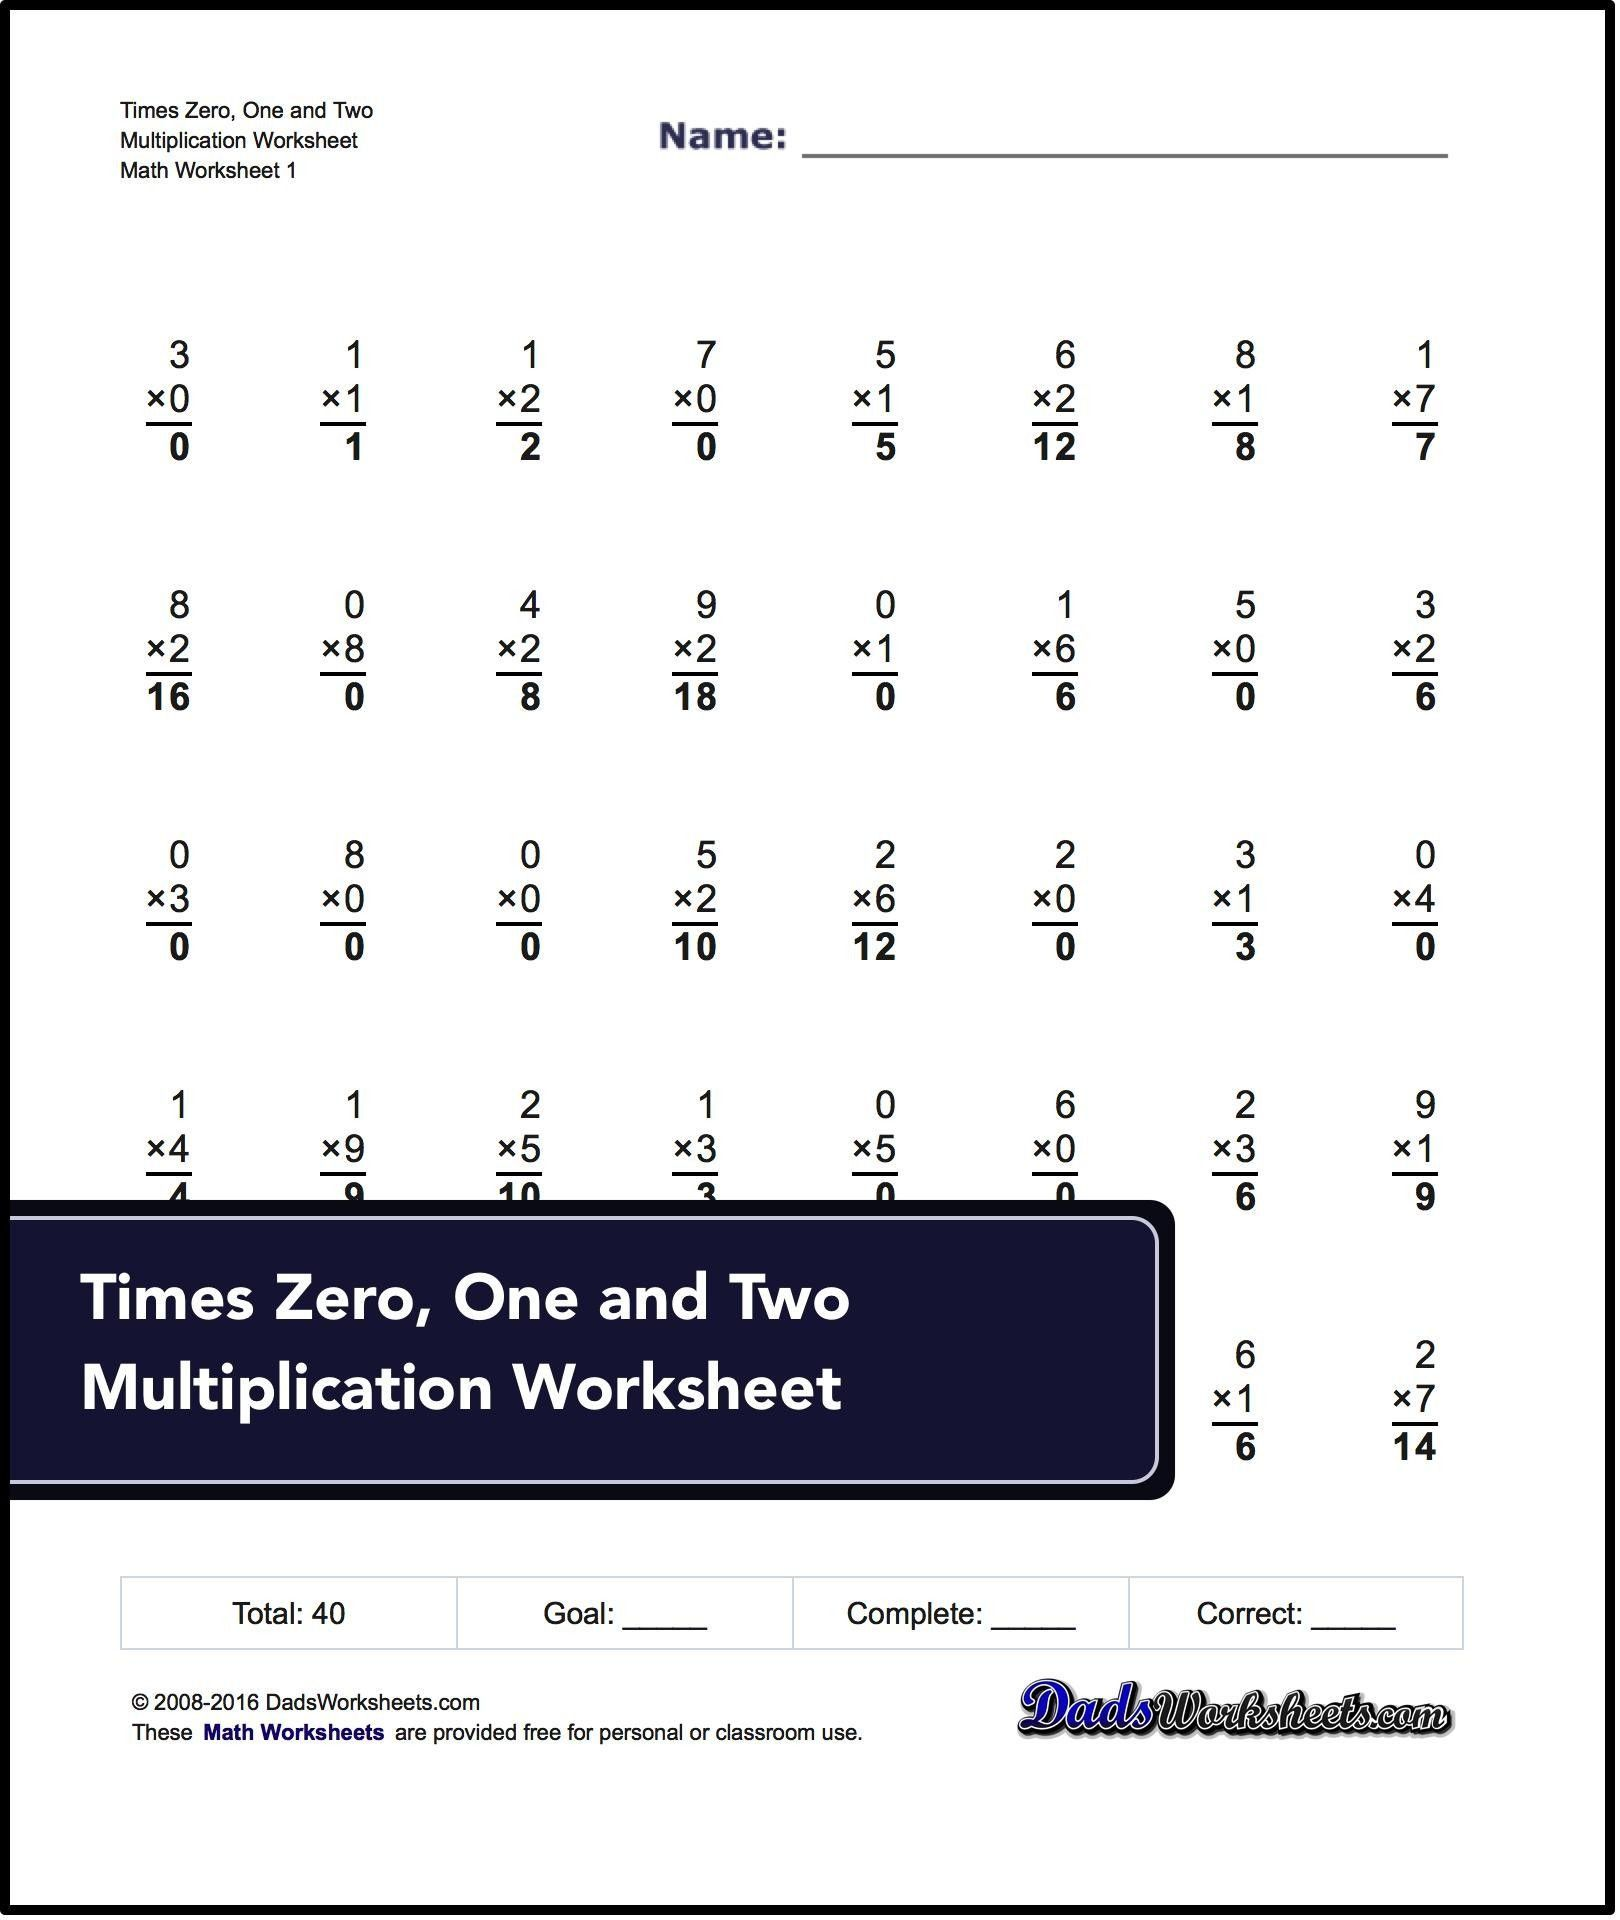 Classifiedfunctional Algebraic Equations Worksheets